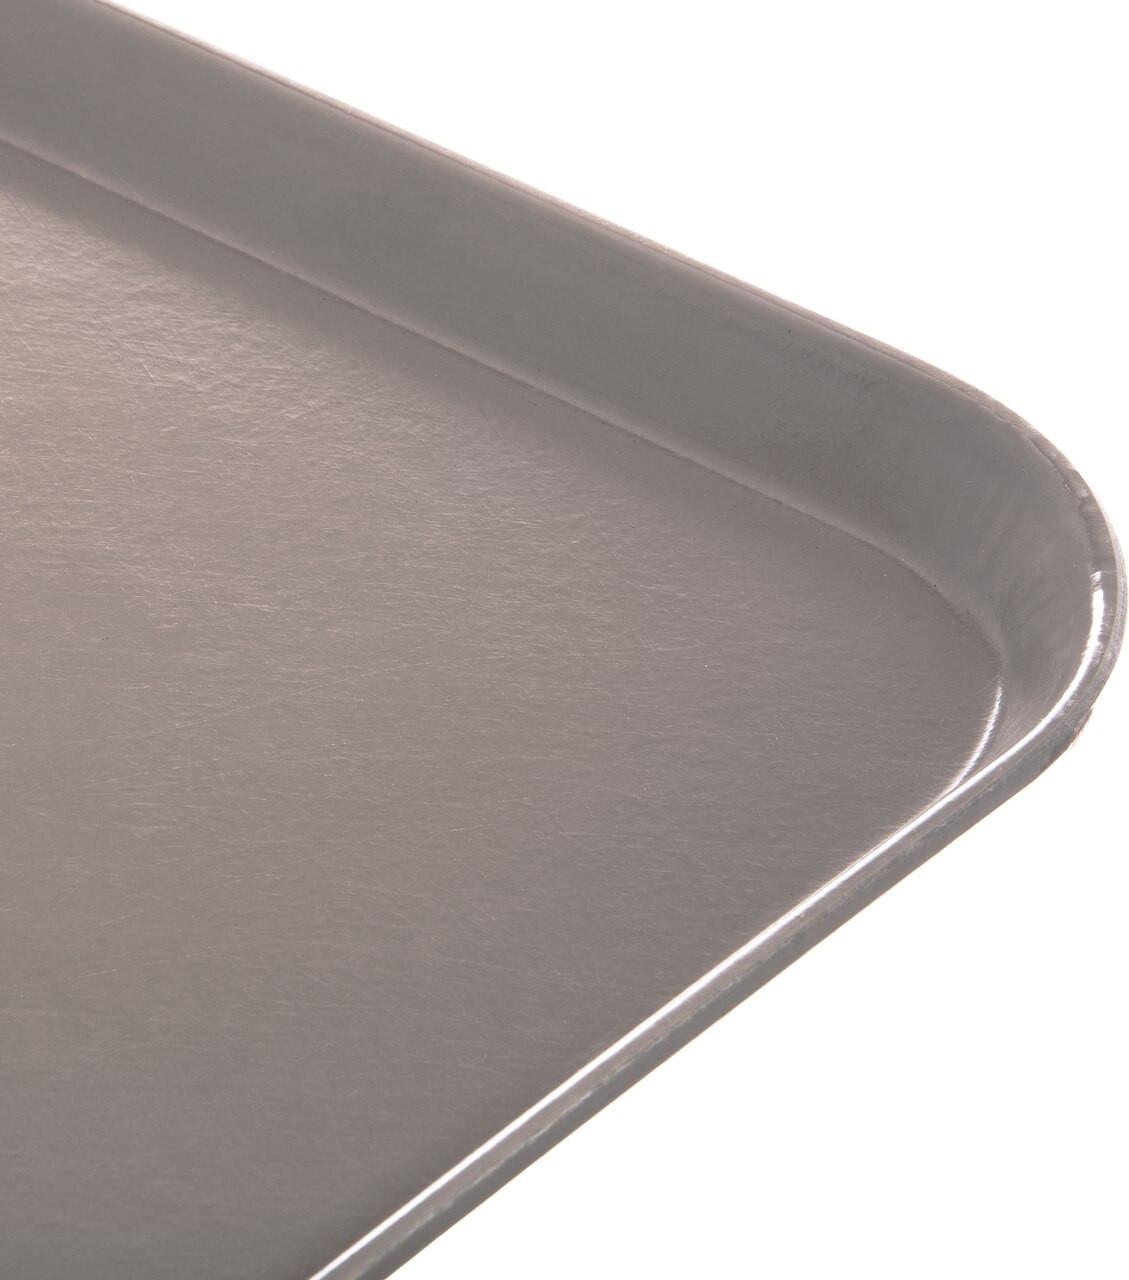 "Tray, 15"" x 20"", size M, flat, fiberglass, latte (12 each per case)"